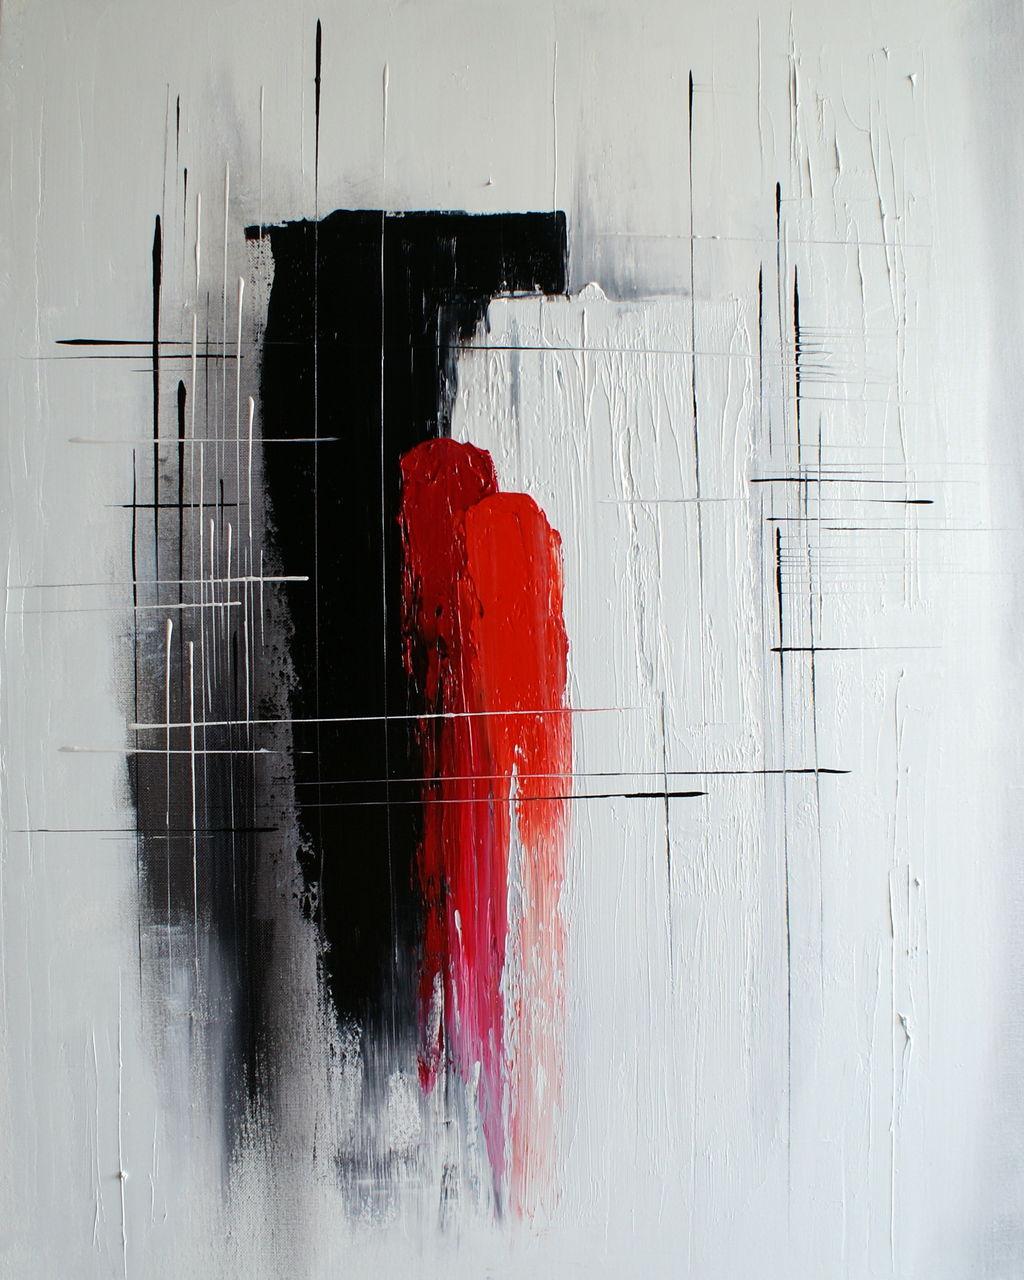 Patrick MARIN L ORIGINE DU TEMPS (2010).